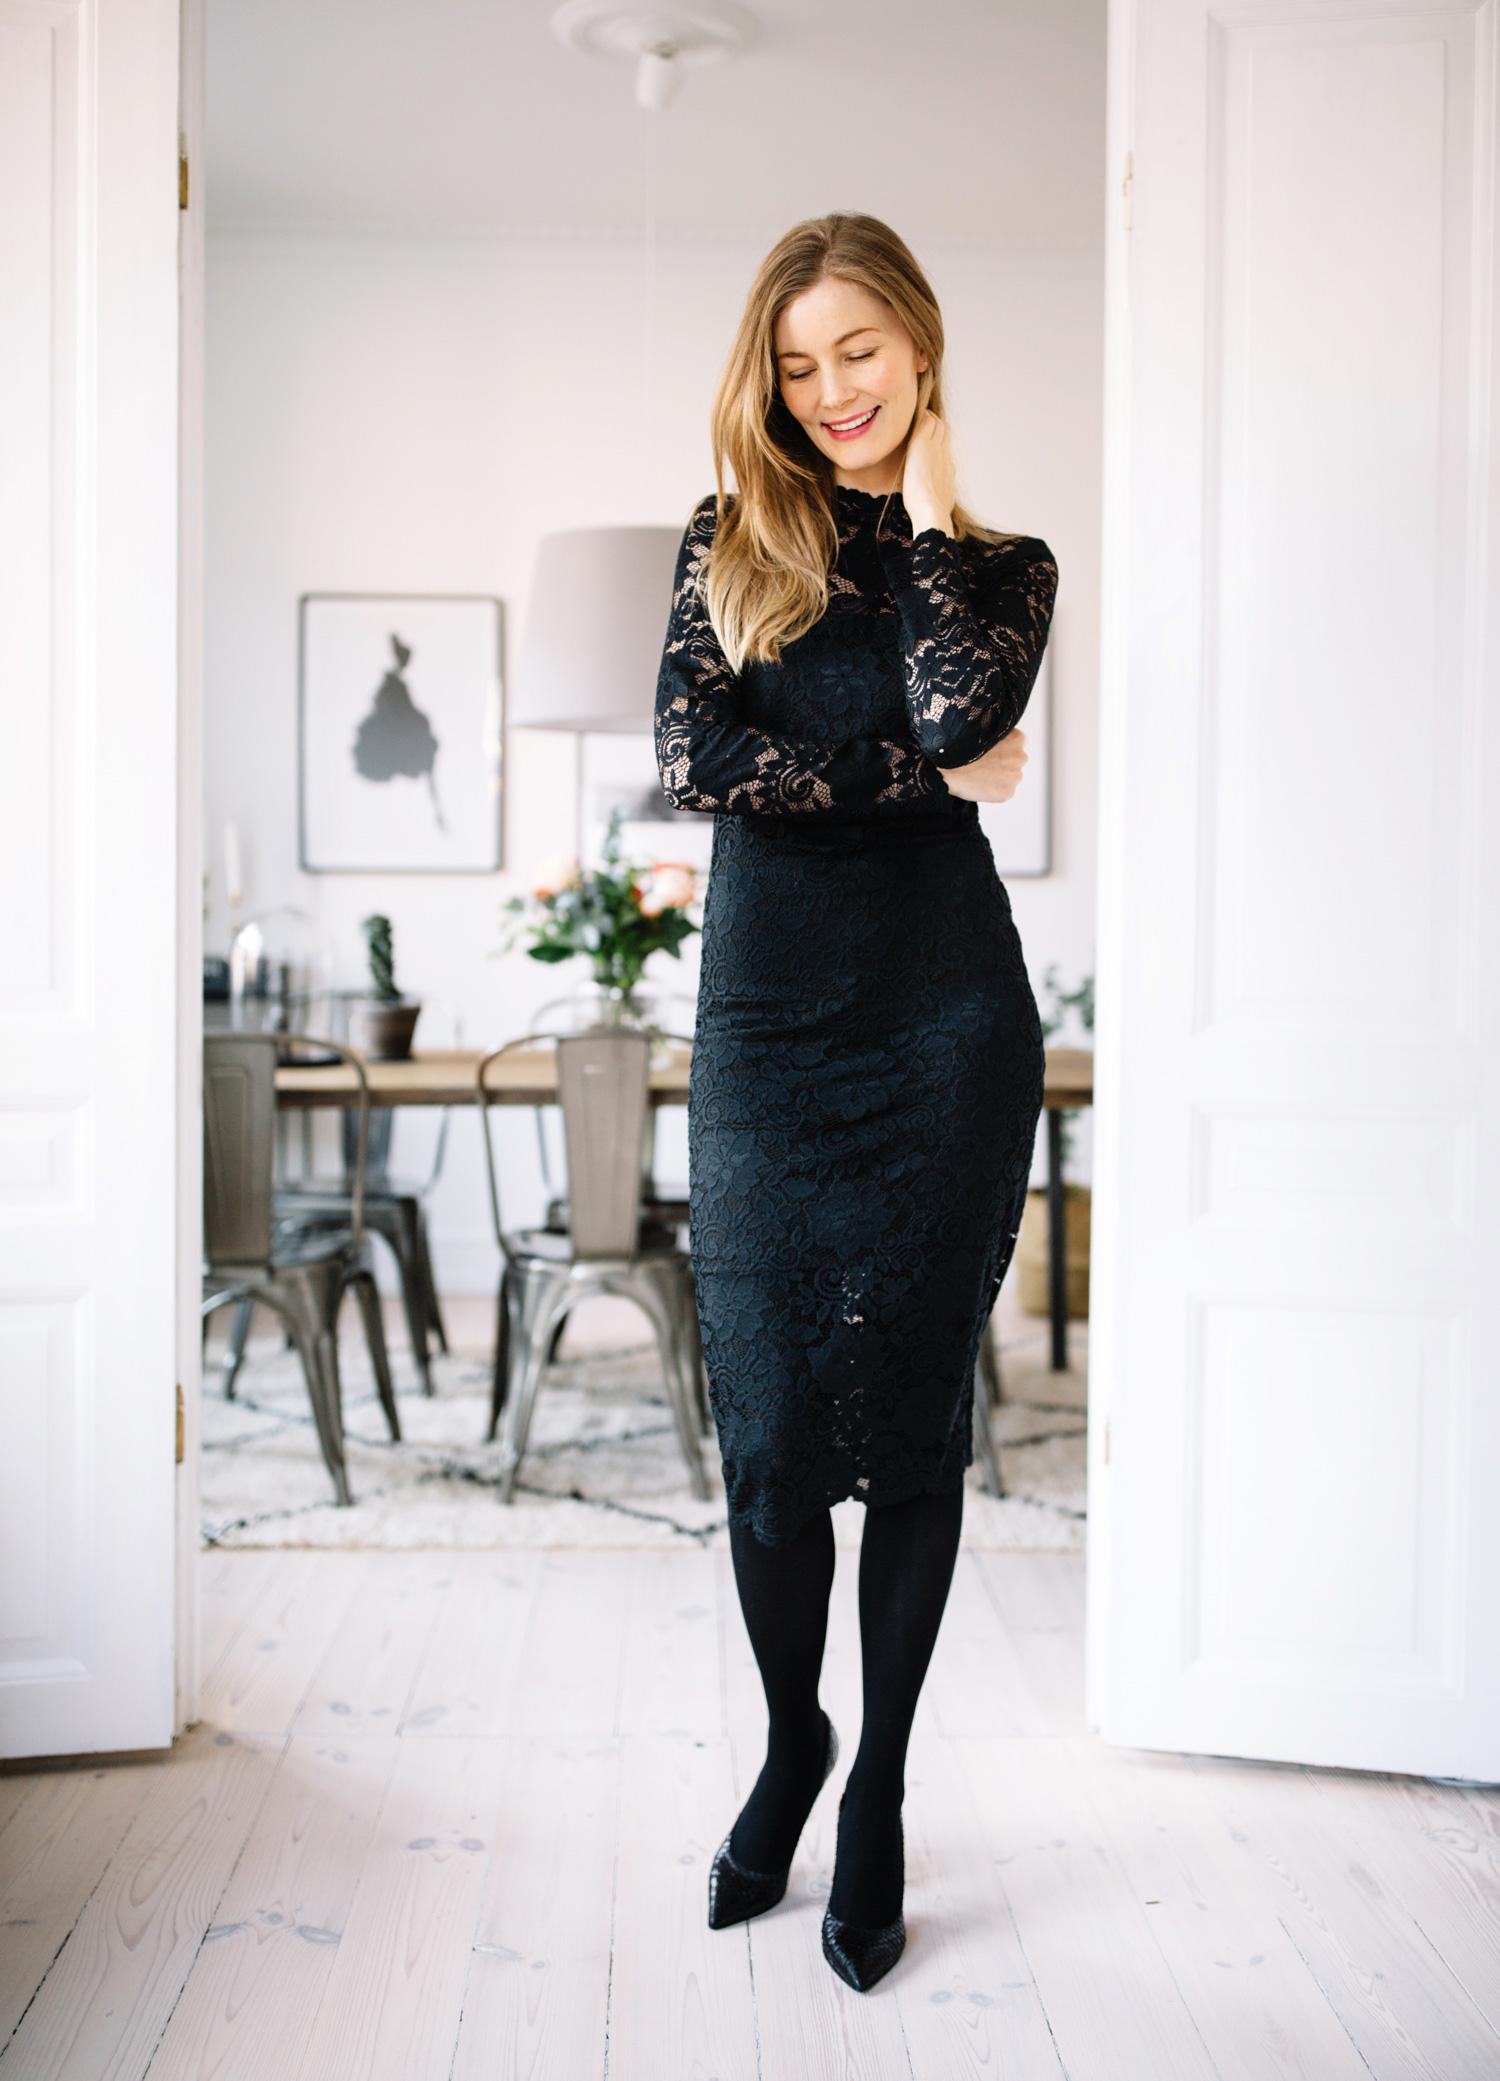 Julefrokost Kjole Christina Dueholm